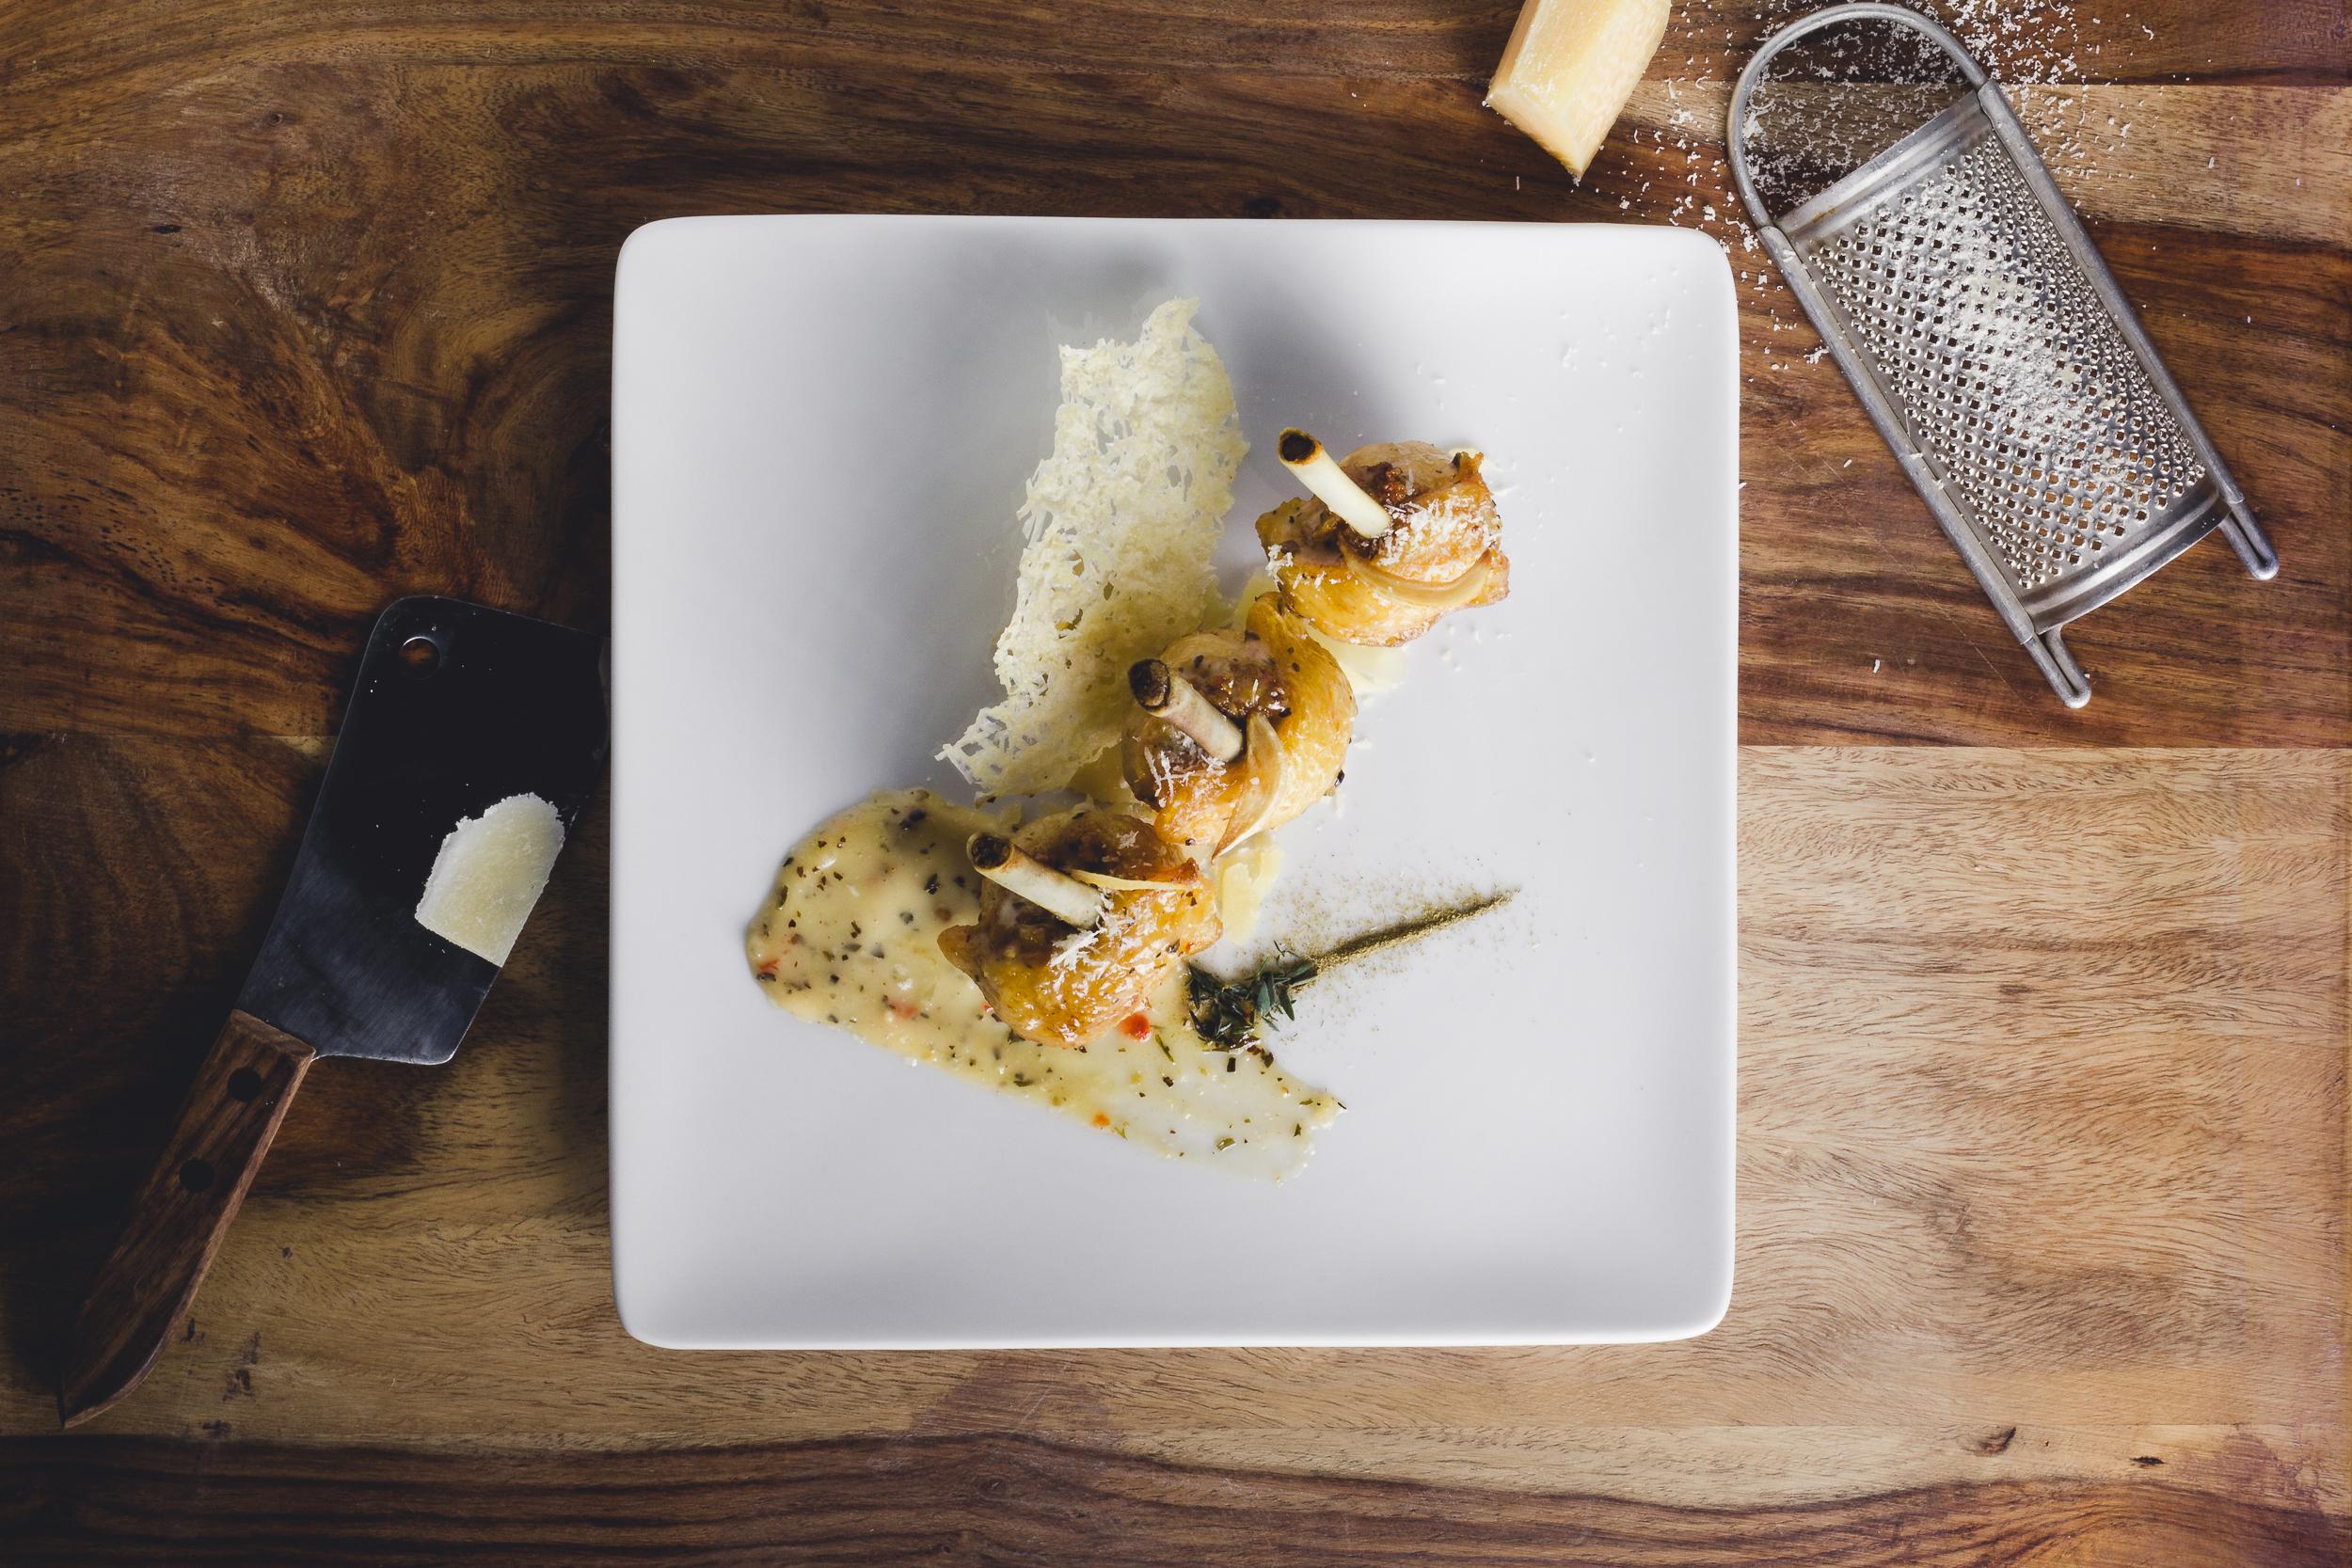 EZ WINGS Garlic Parmesan Wing Lollies